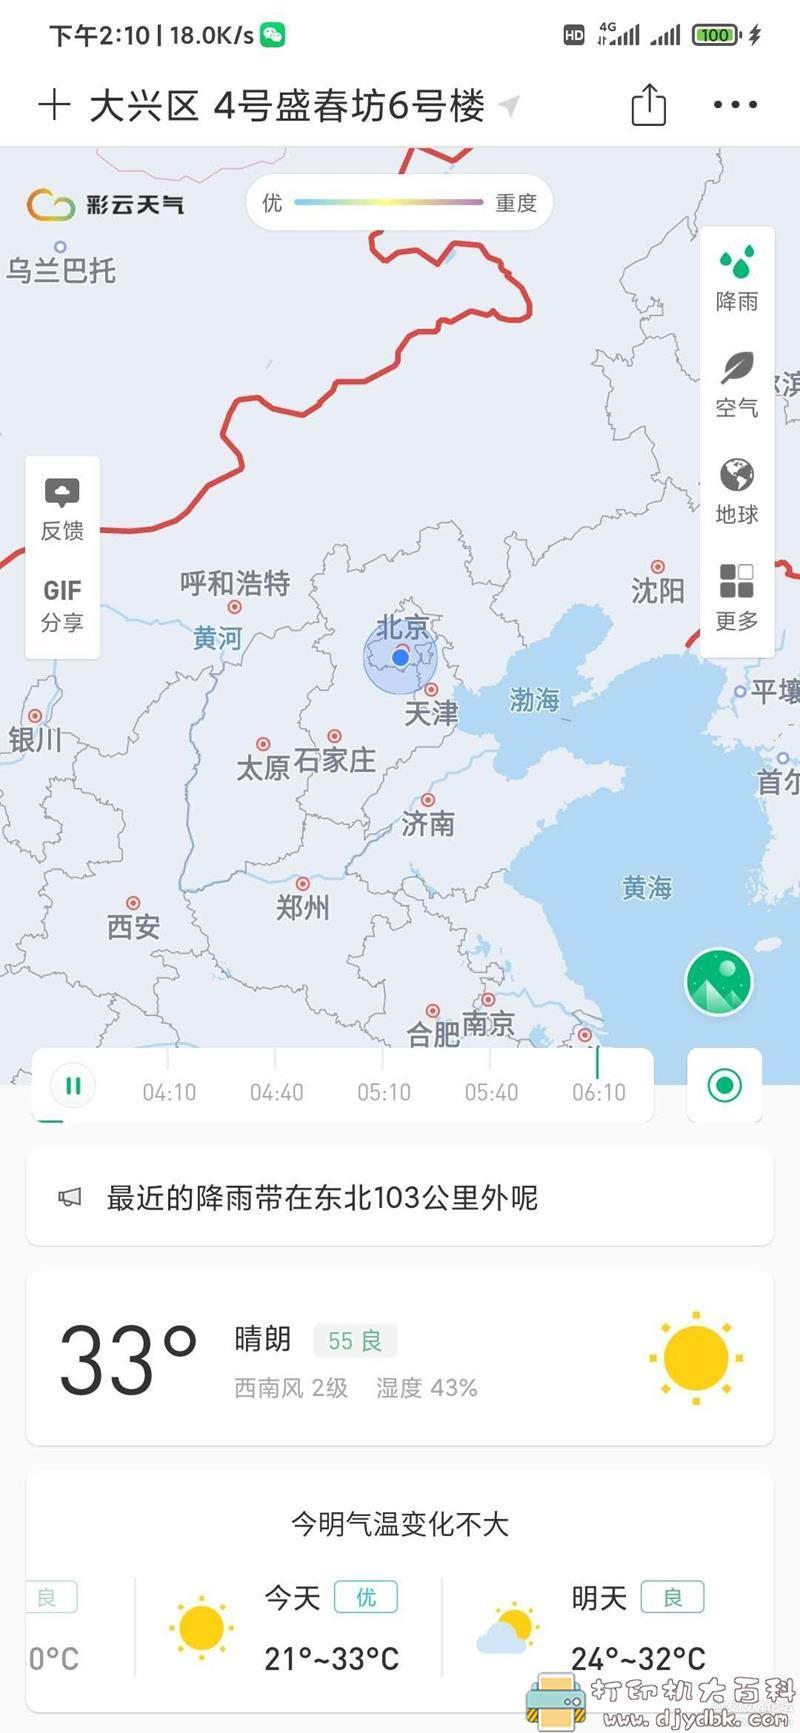 [Android]彩云天气V6.0.0 去广告VIP 精简版图片 No.2